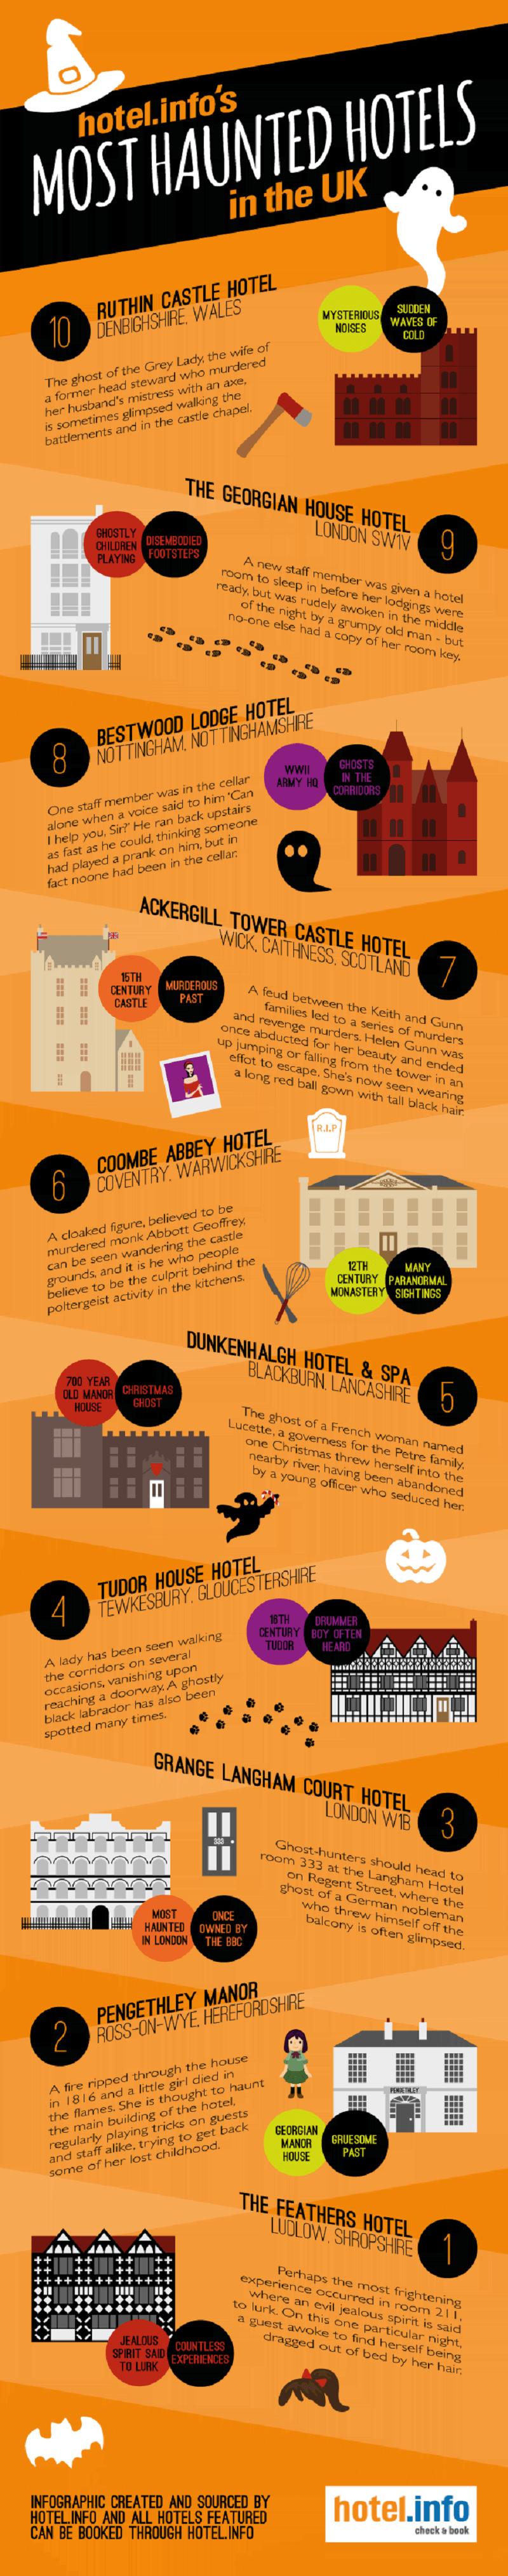 10 Haunted Hotels UK Infographic